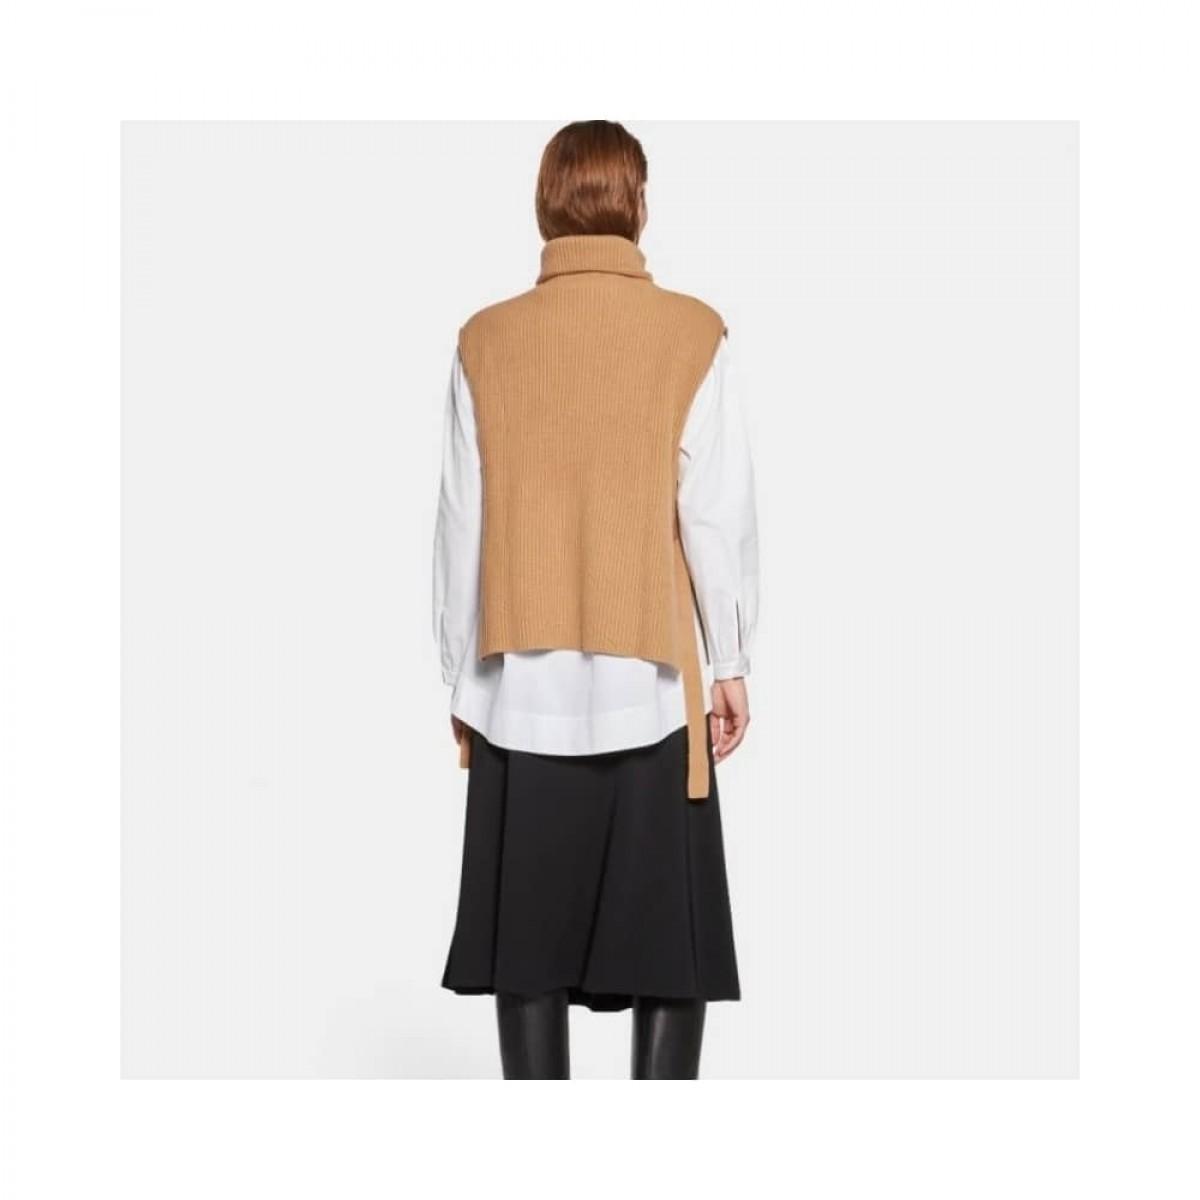 wool high neck gilet vest - camel - model ryg